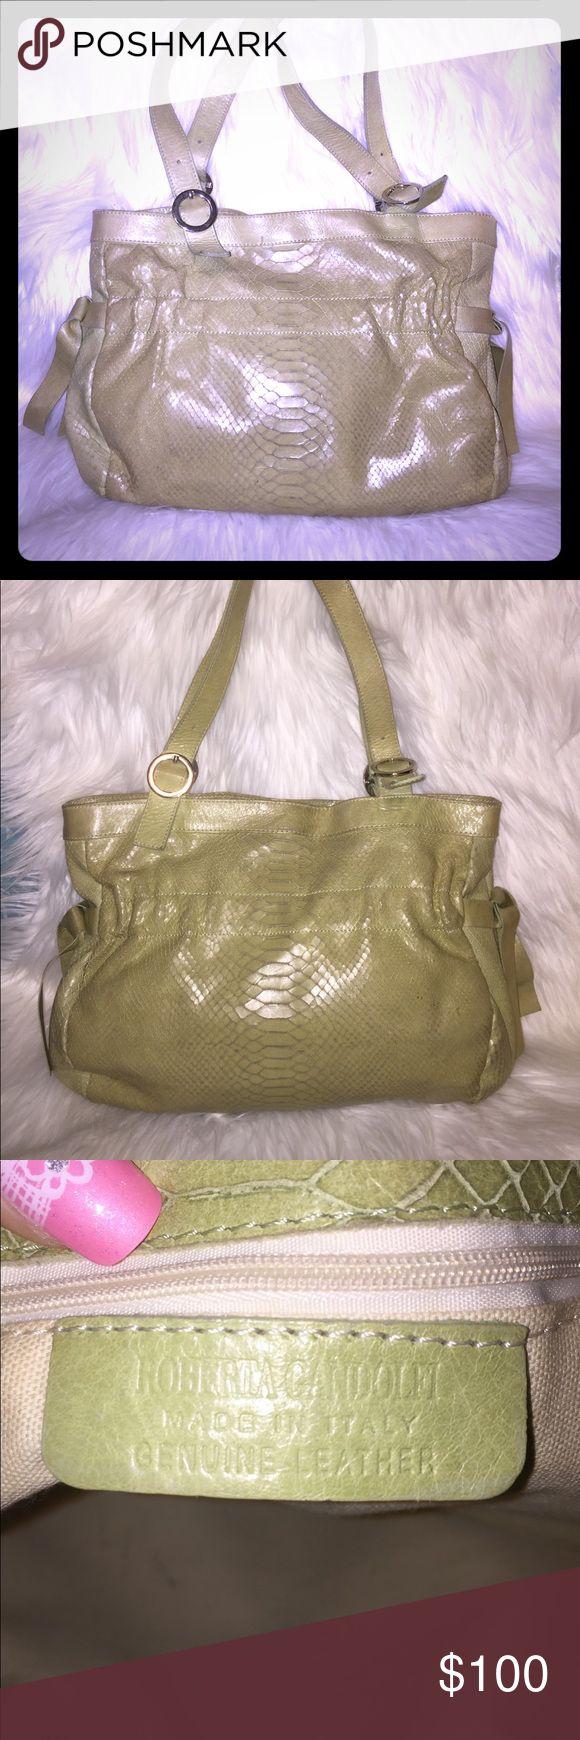 Spotted while shopping on Poshmark: Roberta Gandolfi Snakeskin Green purse vintage! #poshmark #fashion #shopping #style #roberta gandolfi #Handbags